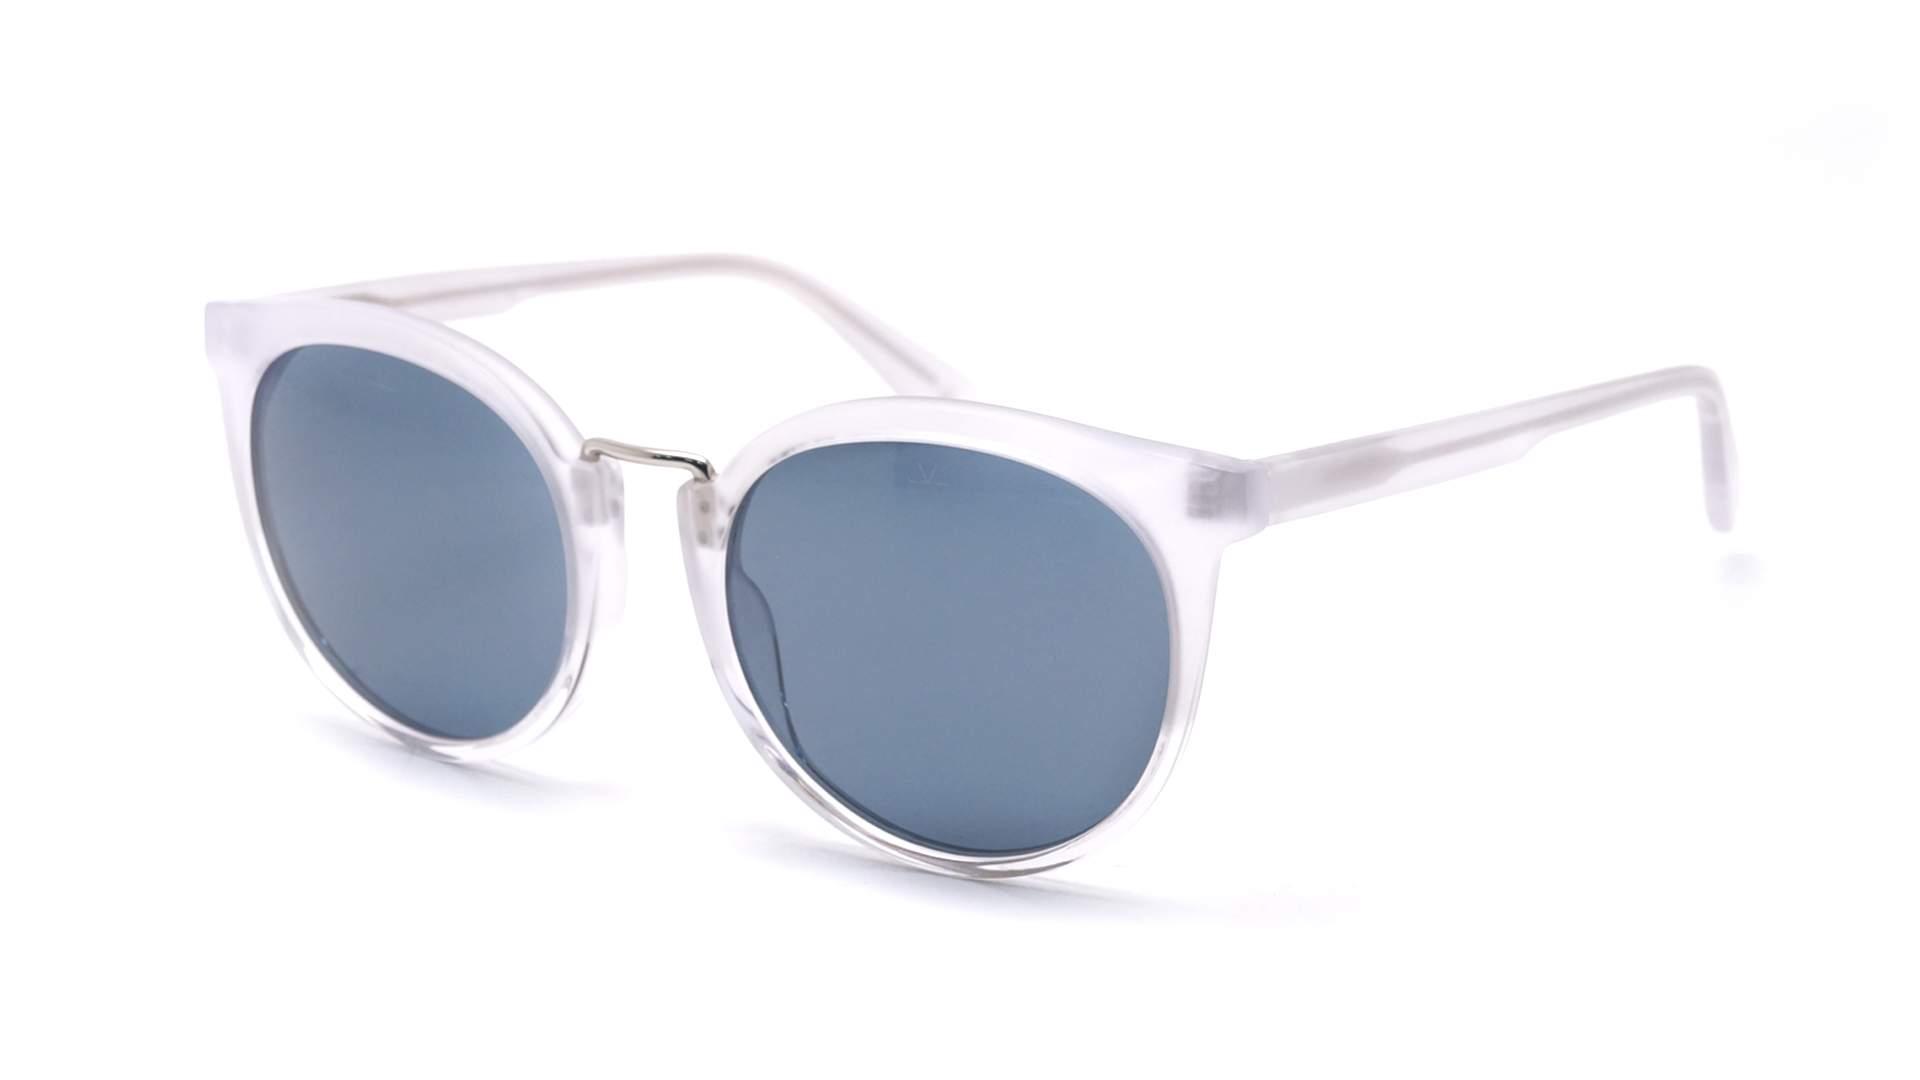 2efaed34382 Sunglasses vuarnet cable car cat eye clear matte blue polar small polarized  jpg 1920x1080 Vuarnet cat